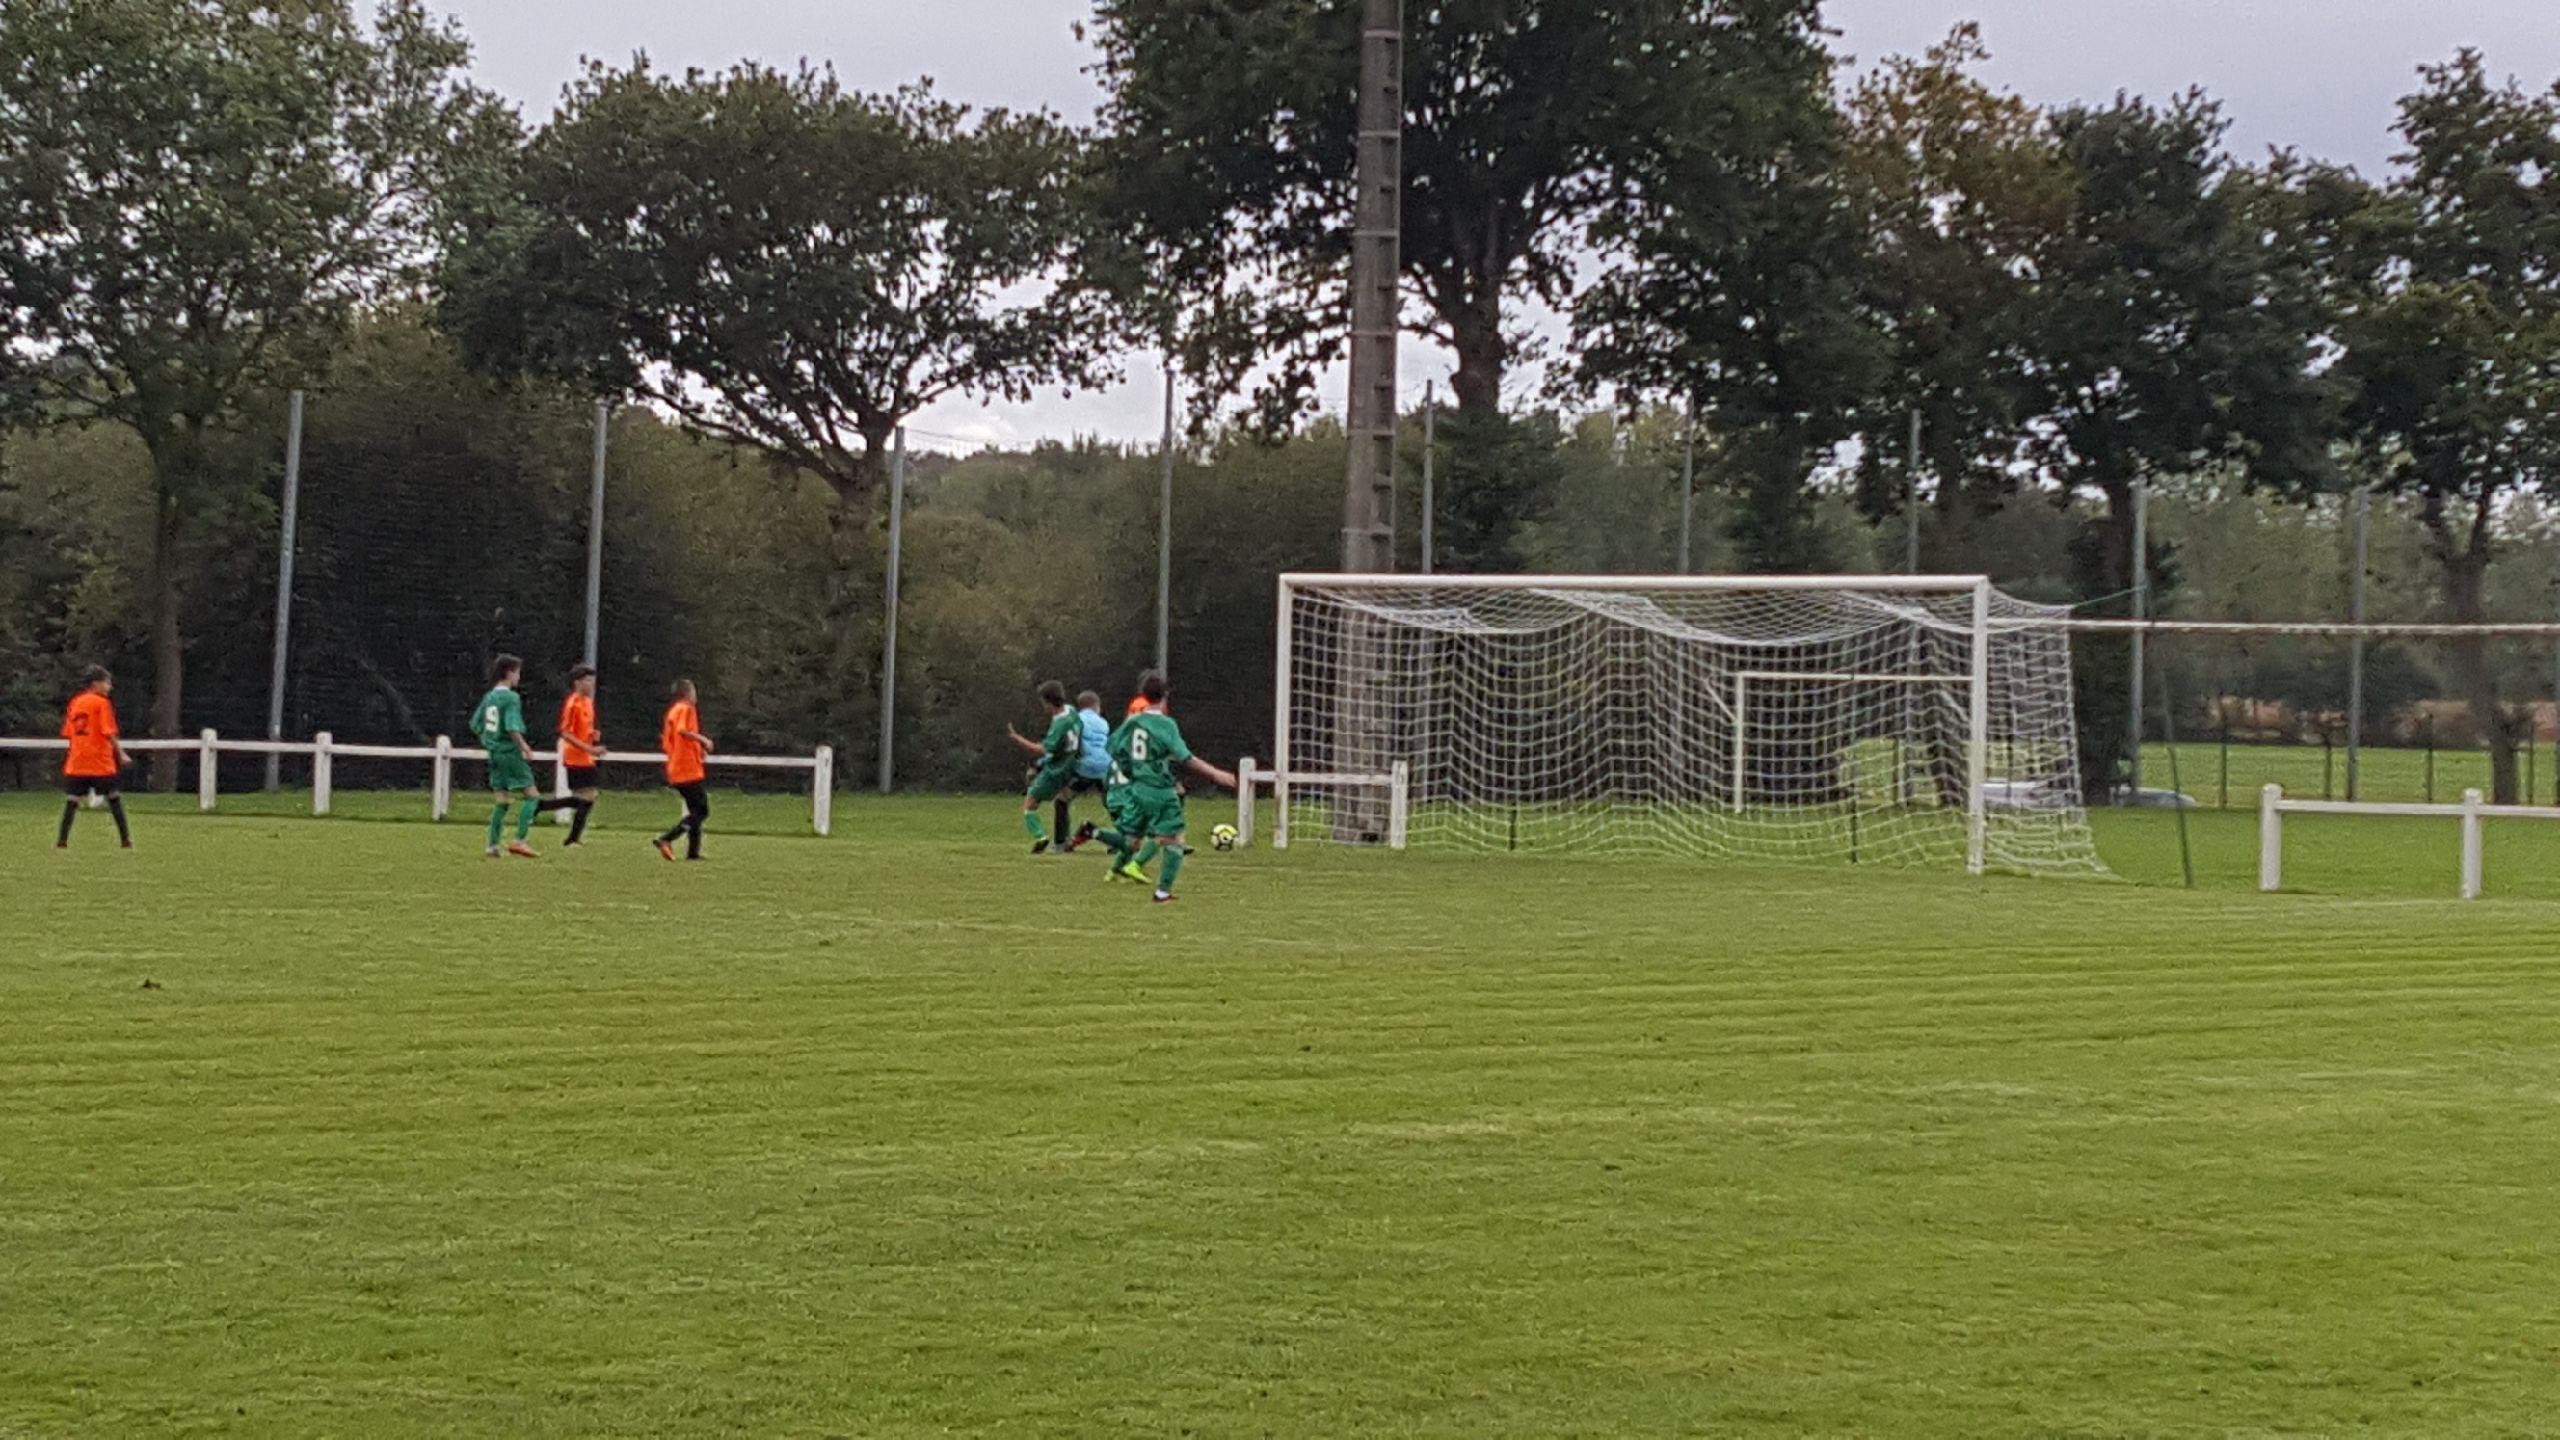 30/09/2017 Elven gagne 10 -2